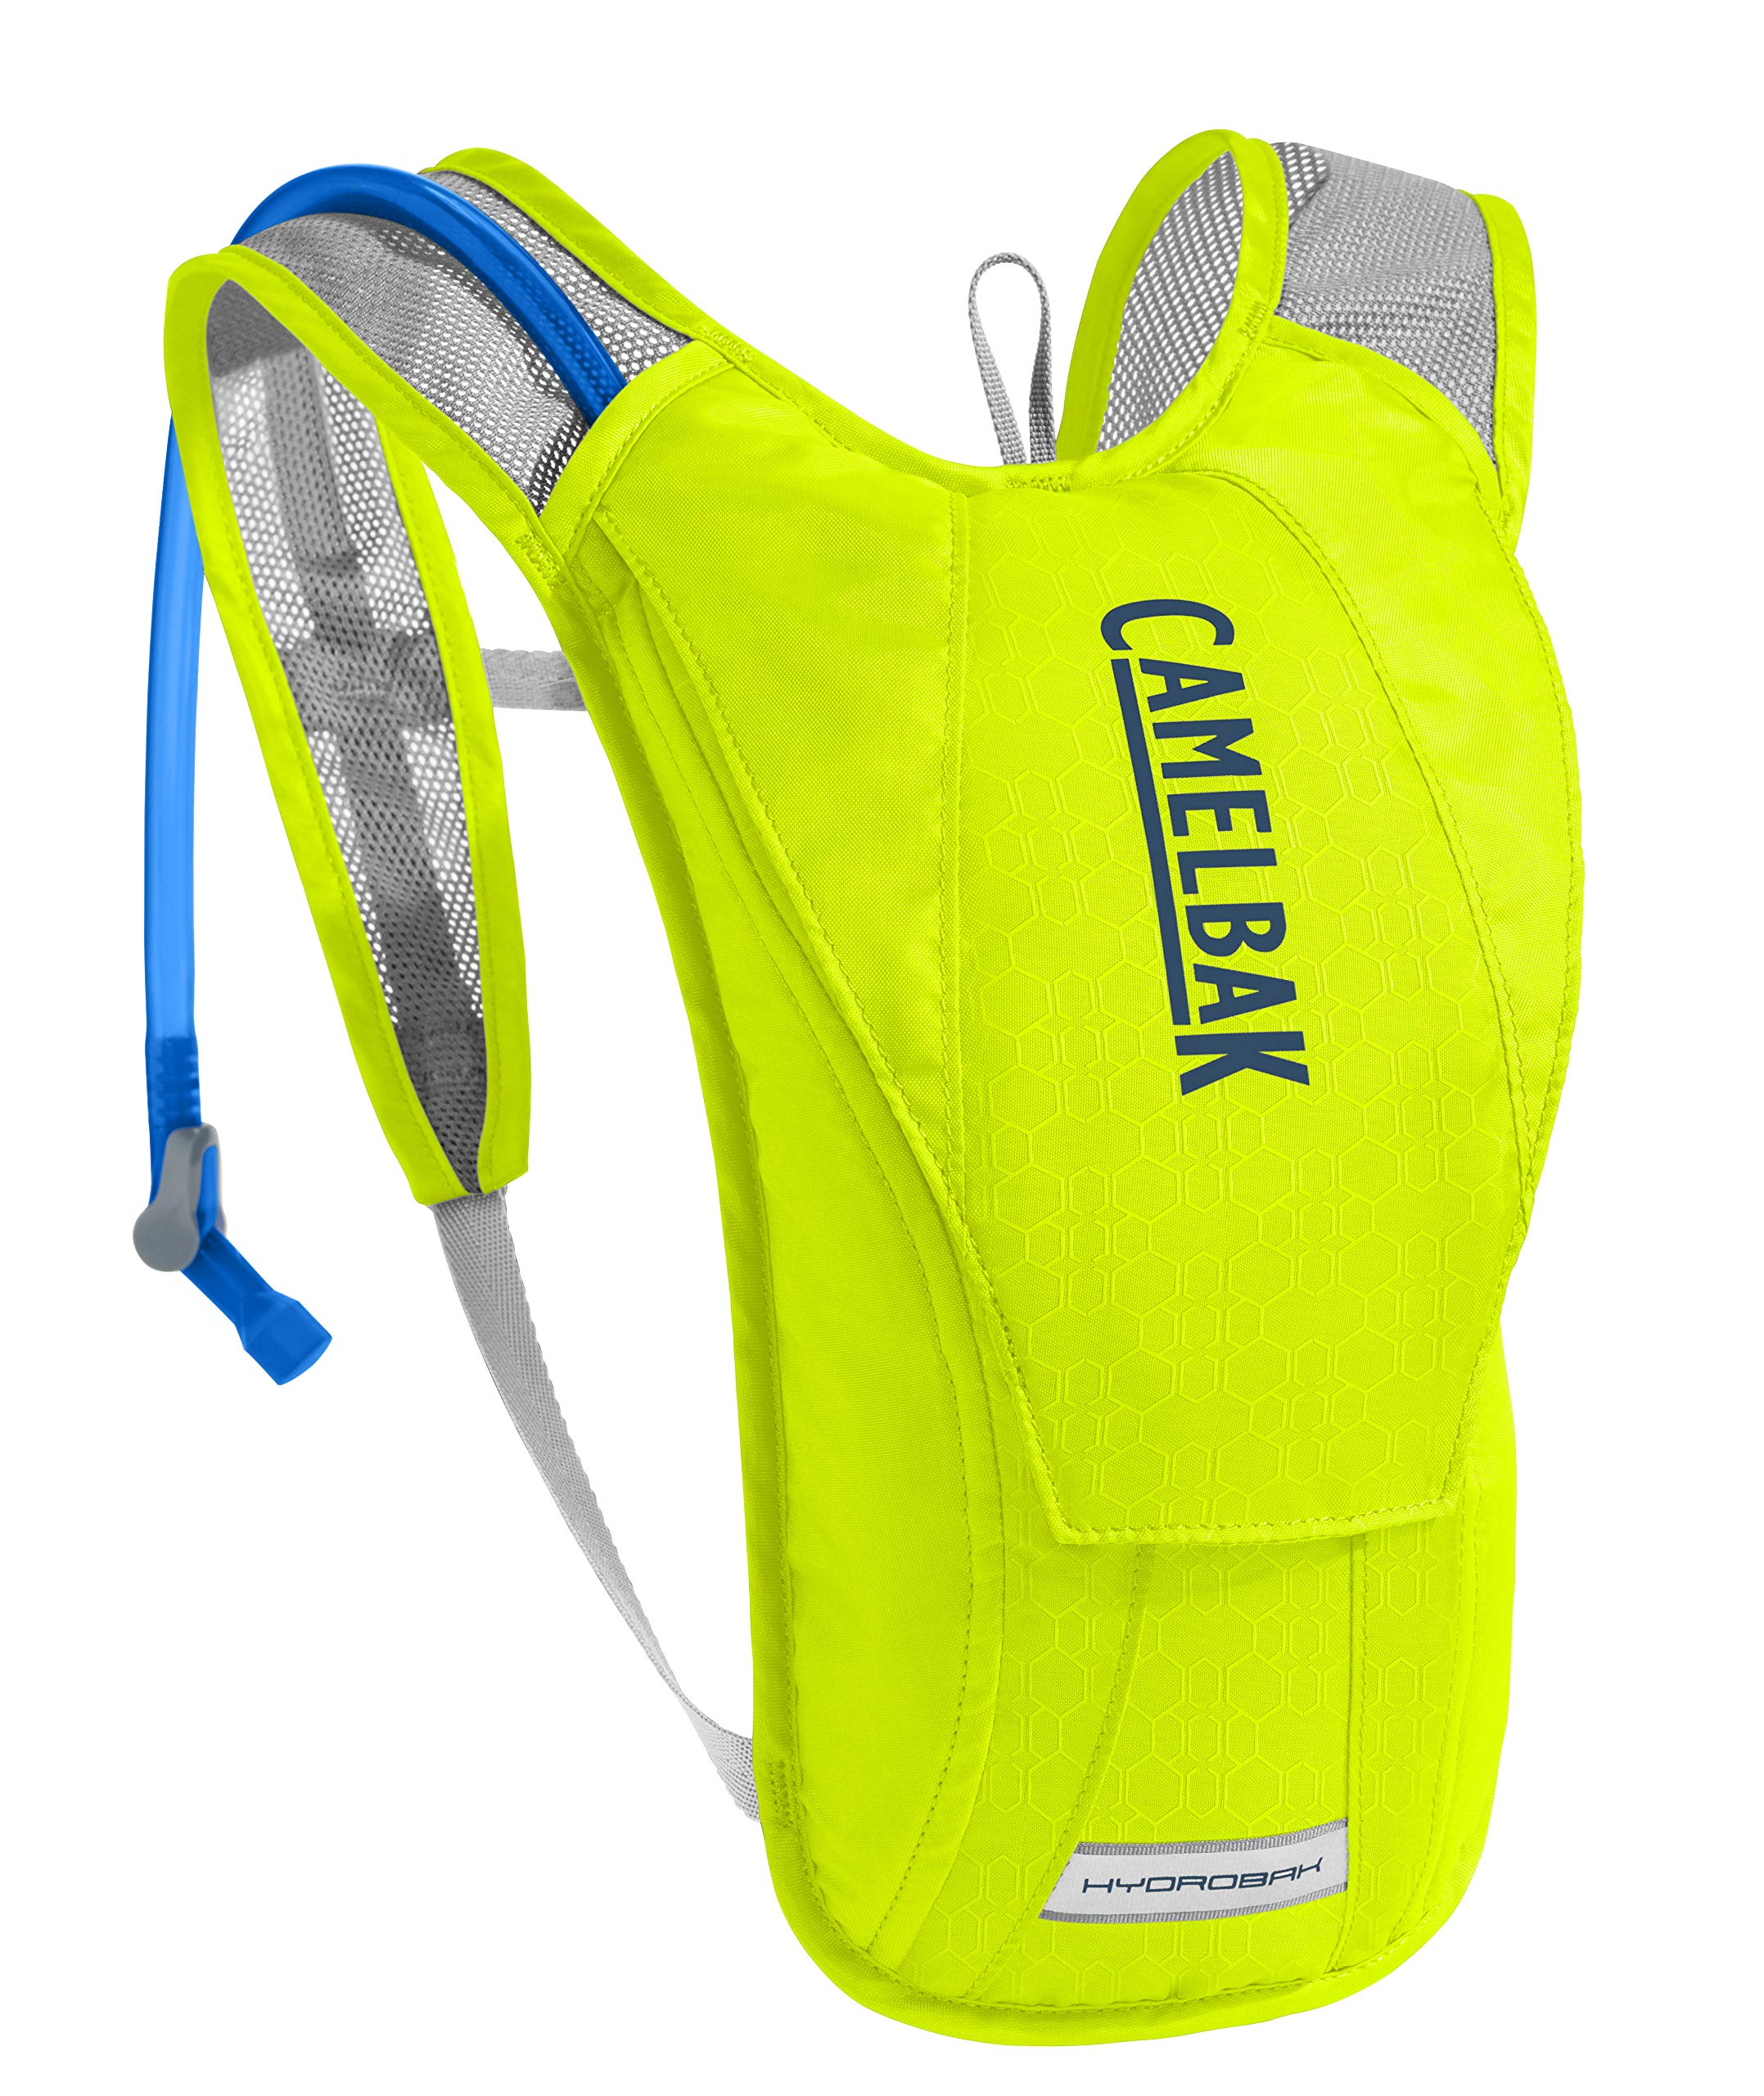 CamelBak HydroBak 50 oz, Safety Yellow/Navy, One Size by CamelBak